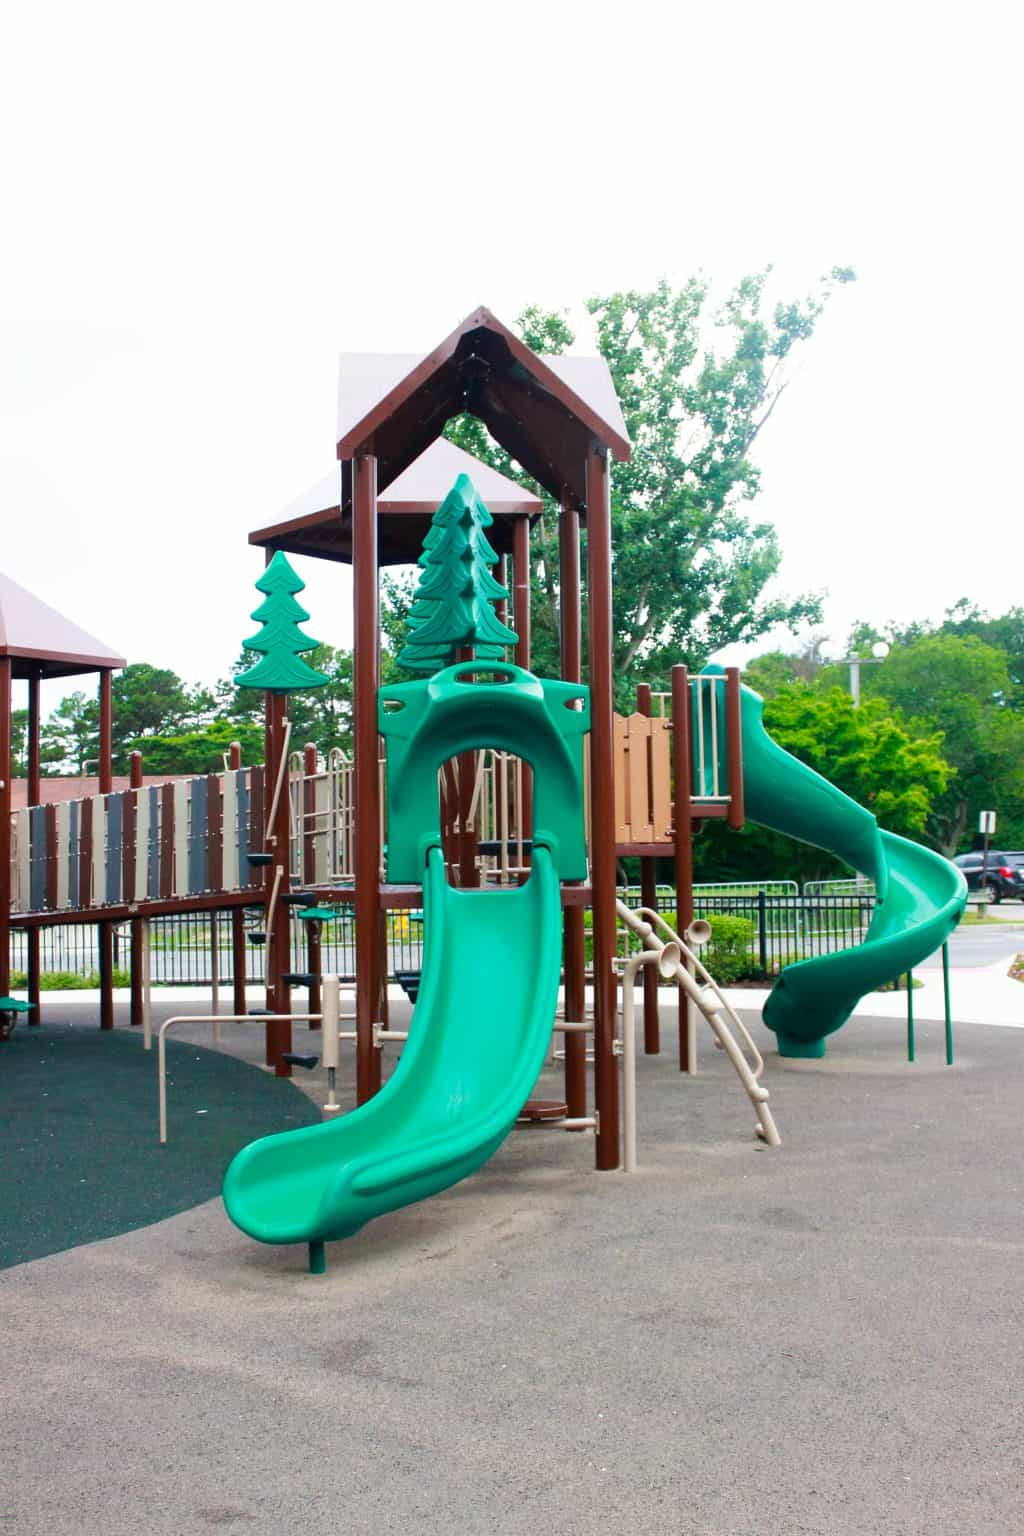 windward-beach-park-playground-brick-nj_28266703875_o-1024x1536